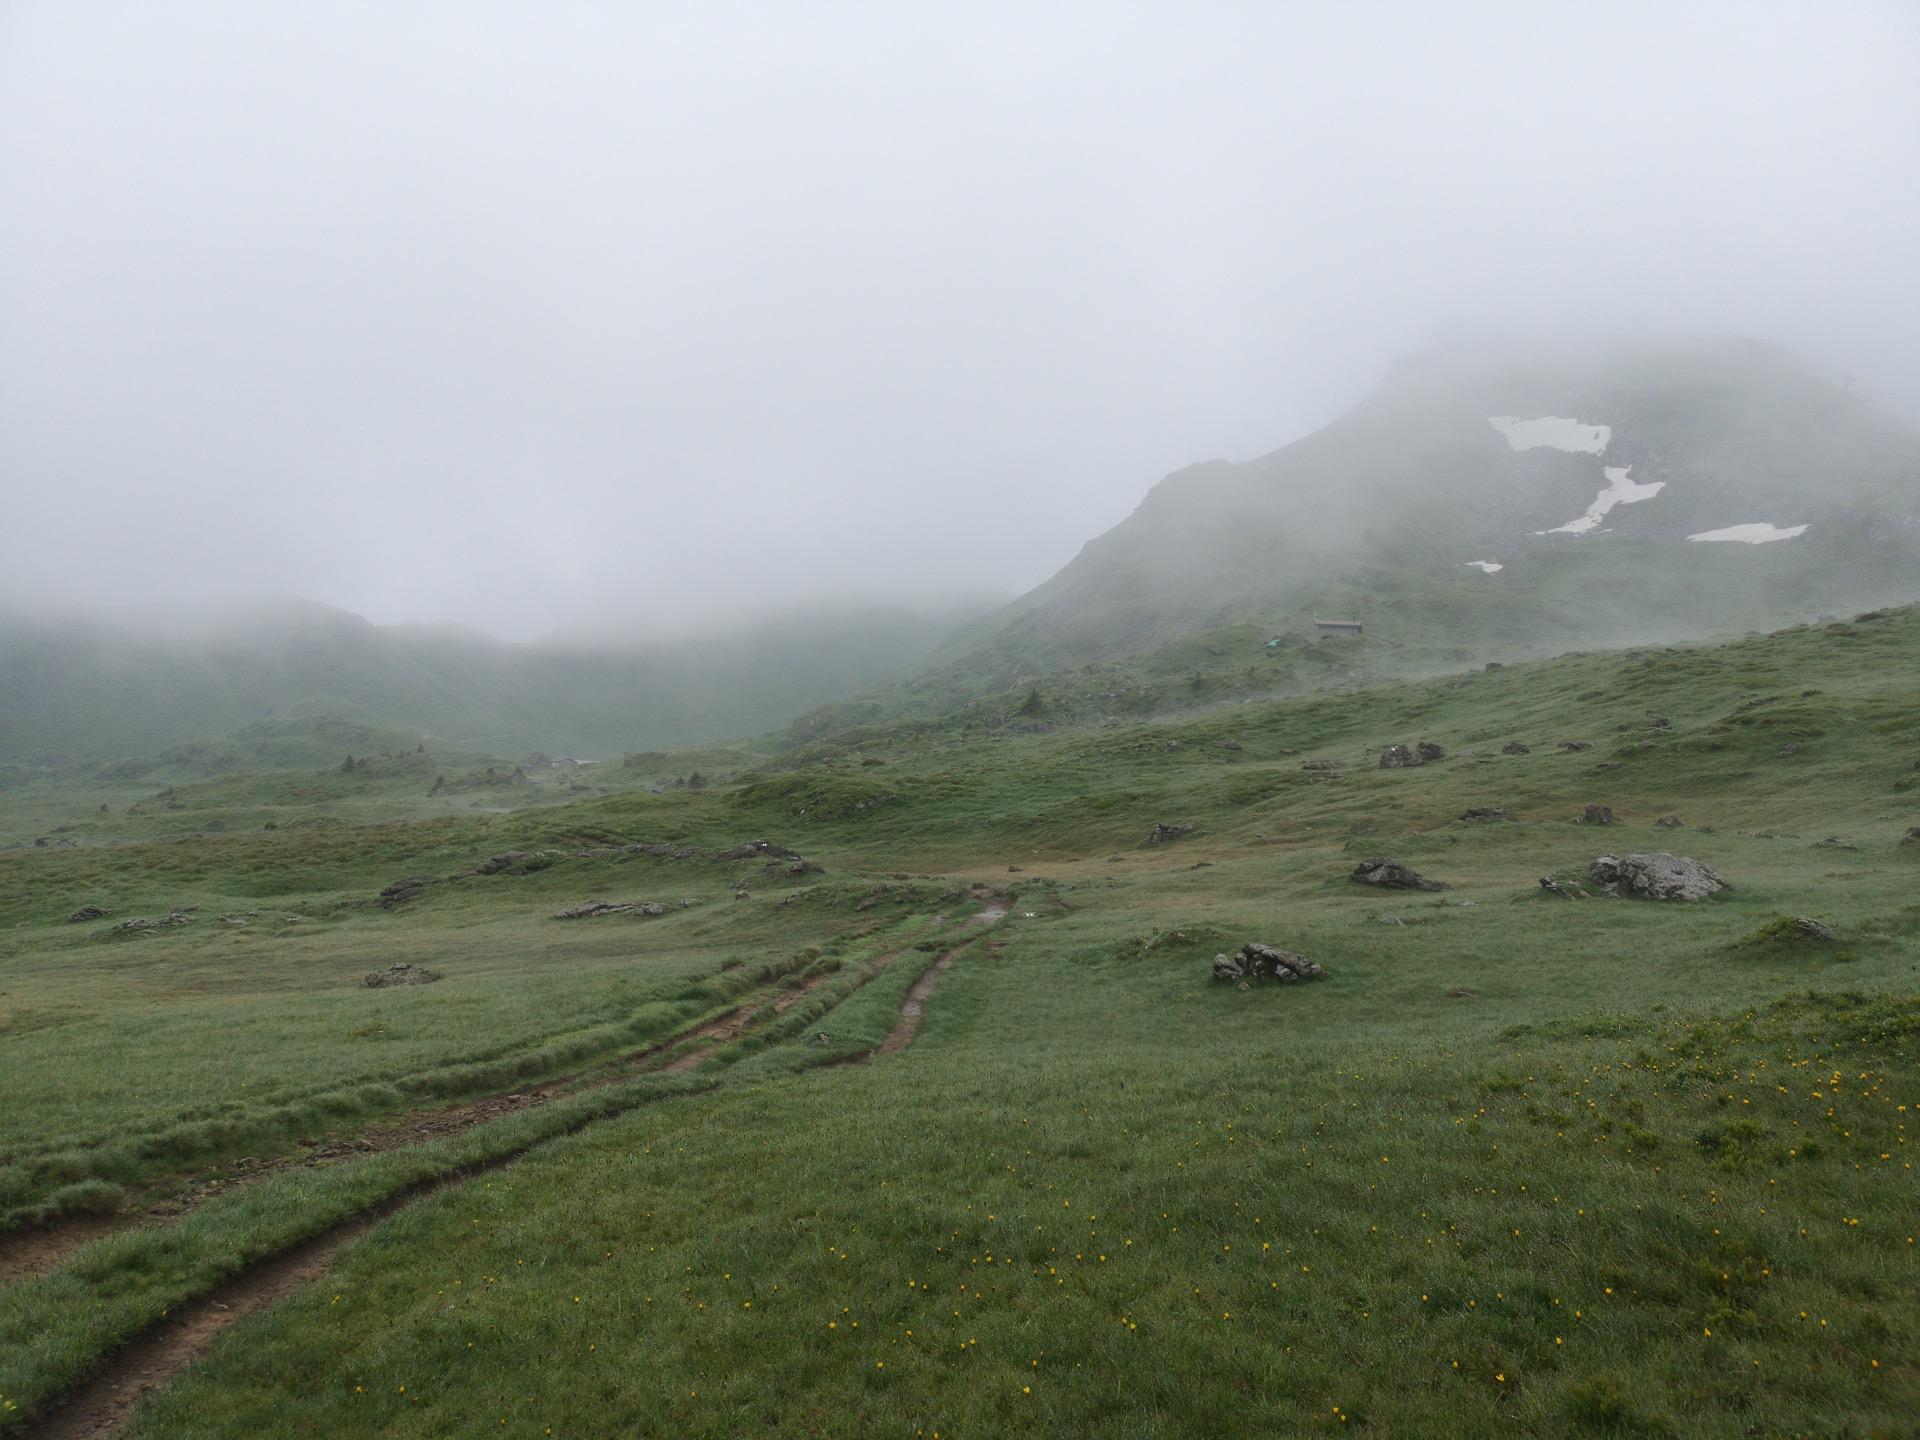 Dans la brume, on se rapproche du refuge de Chésery